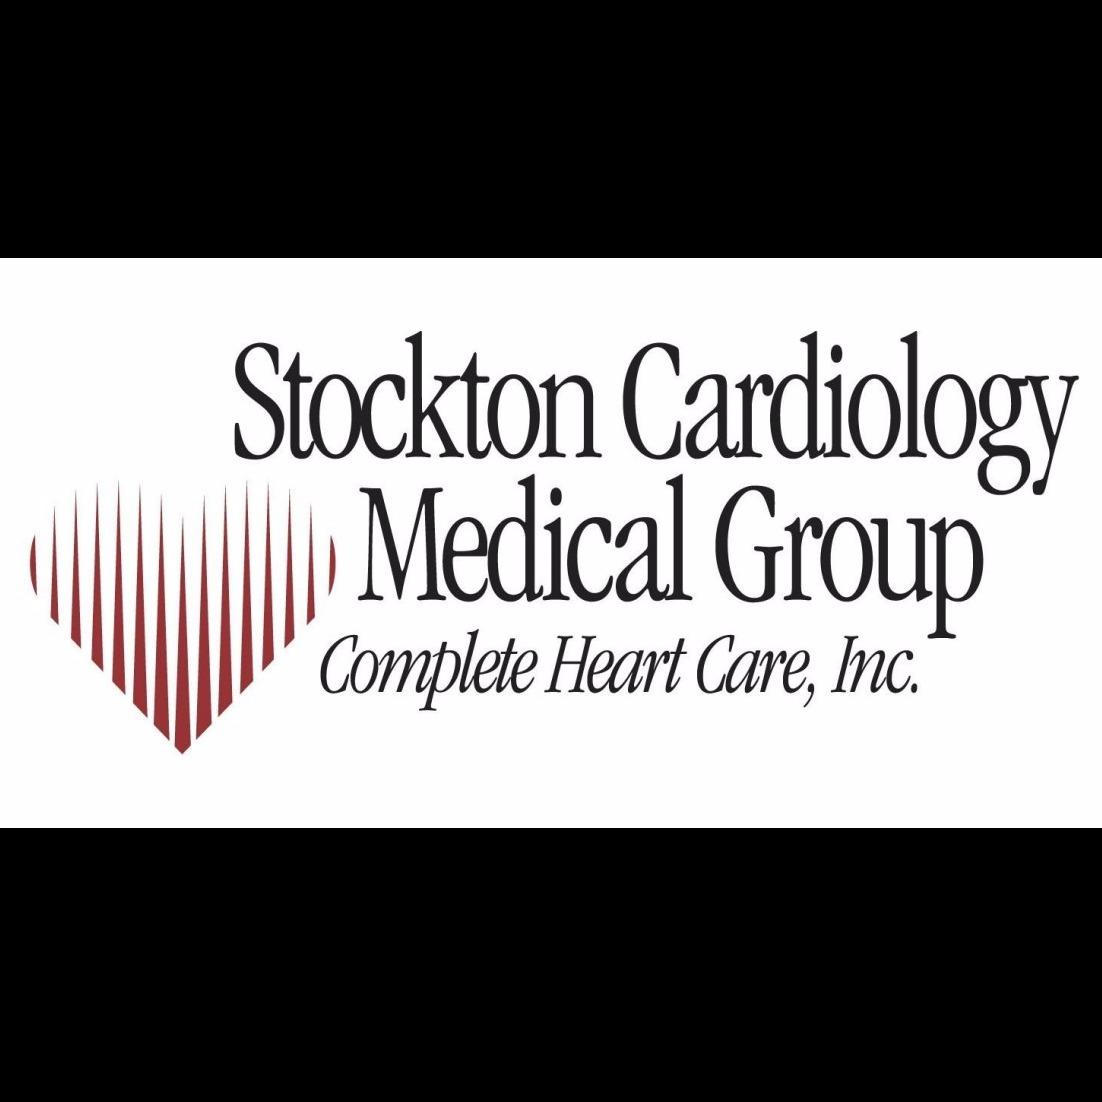 Stockton Cardiology Medical Group image 3